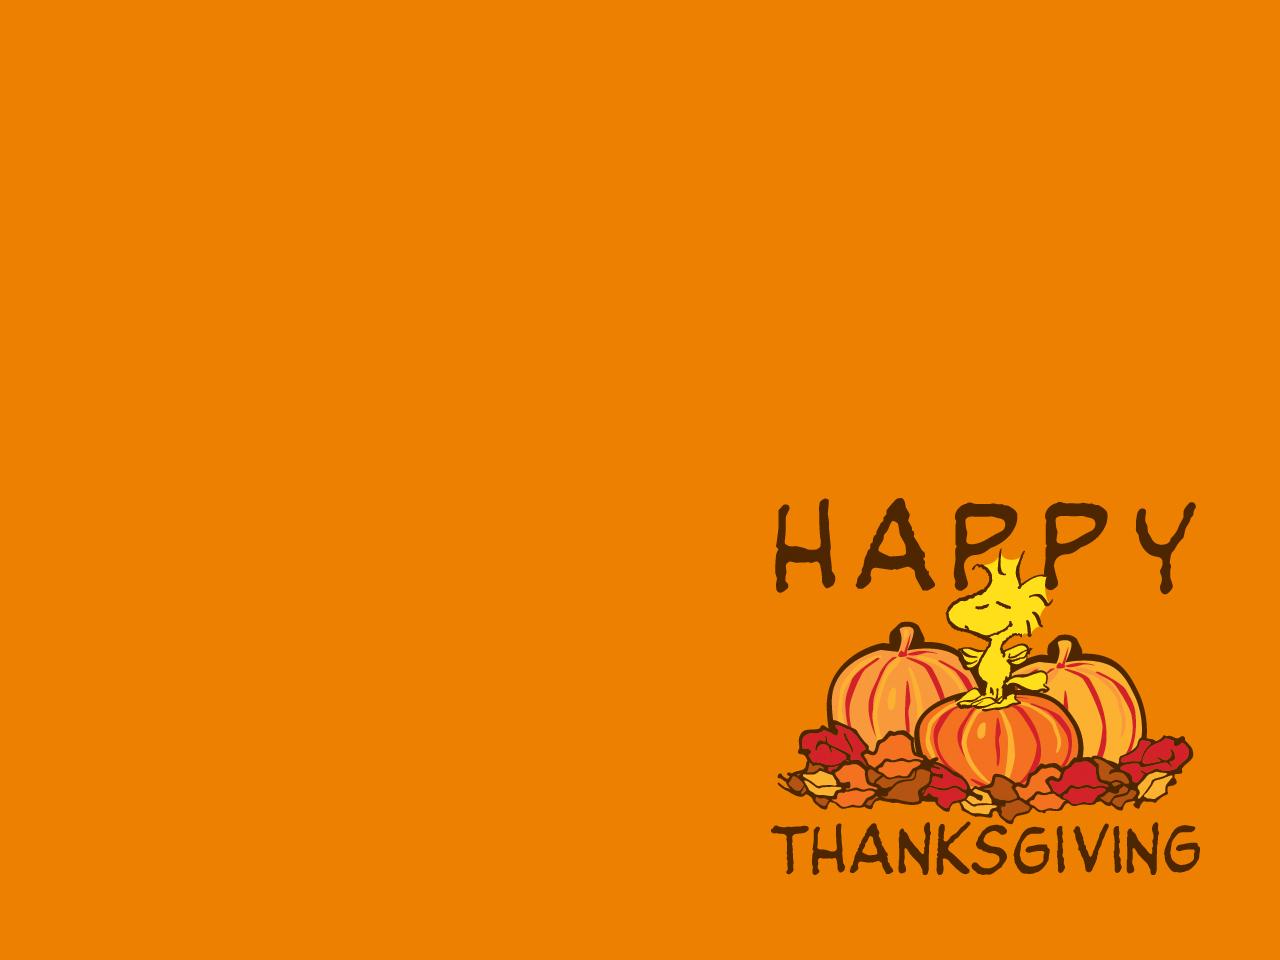 78] Thanksgiving Wallpaper Backgrounds on WallpaperSafari 1280x960